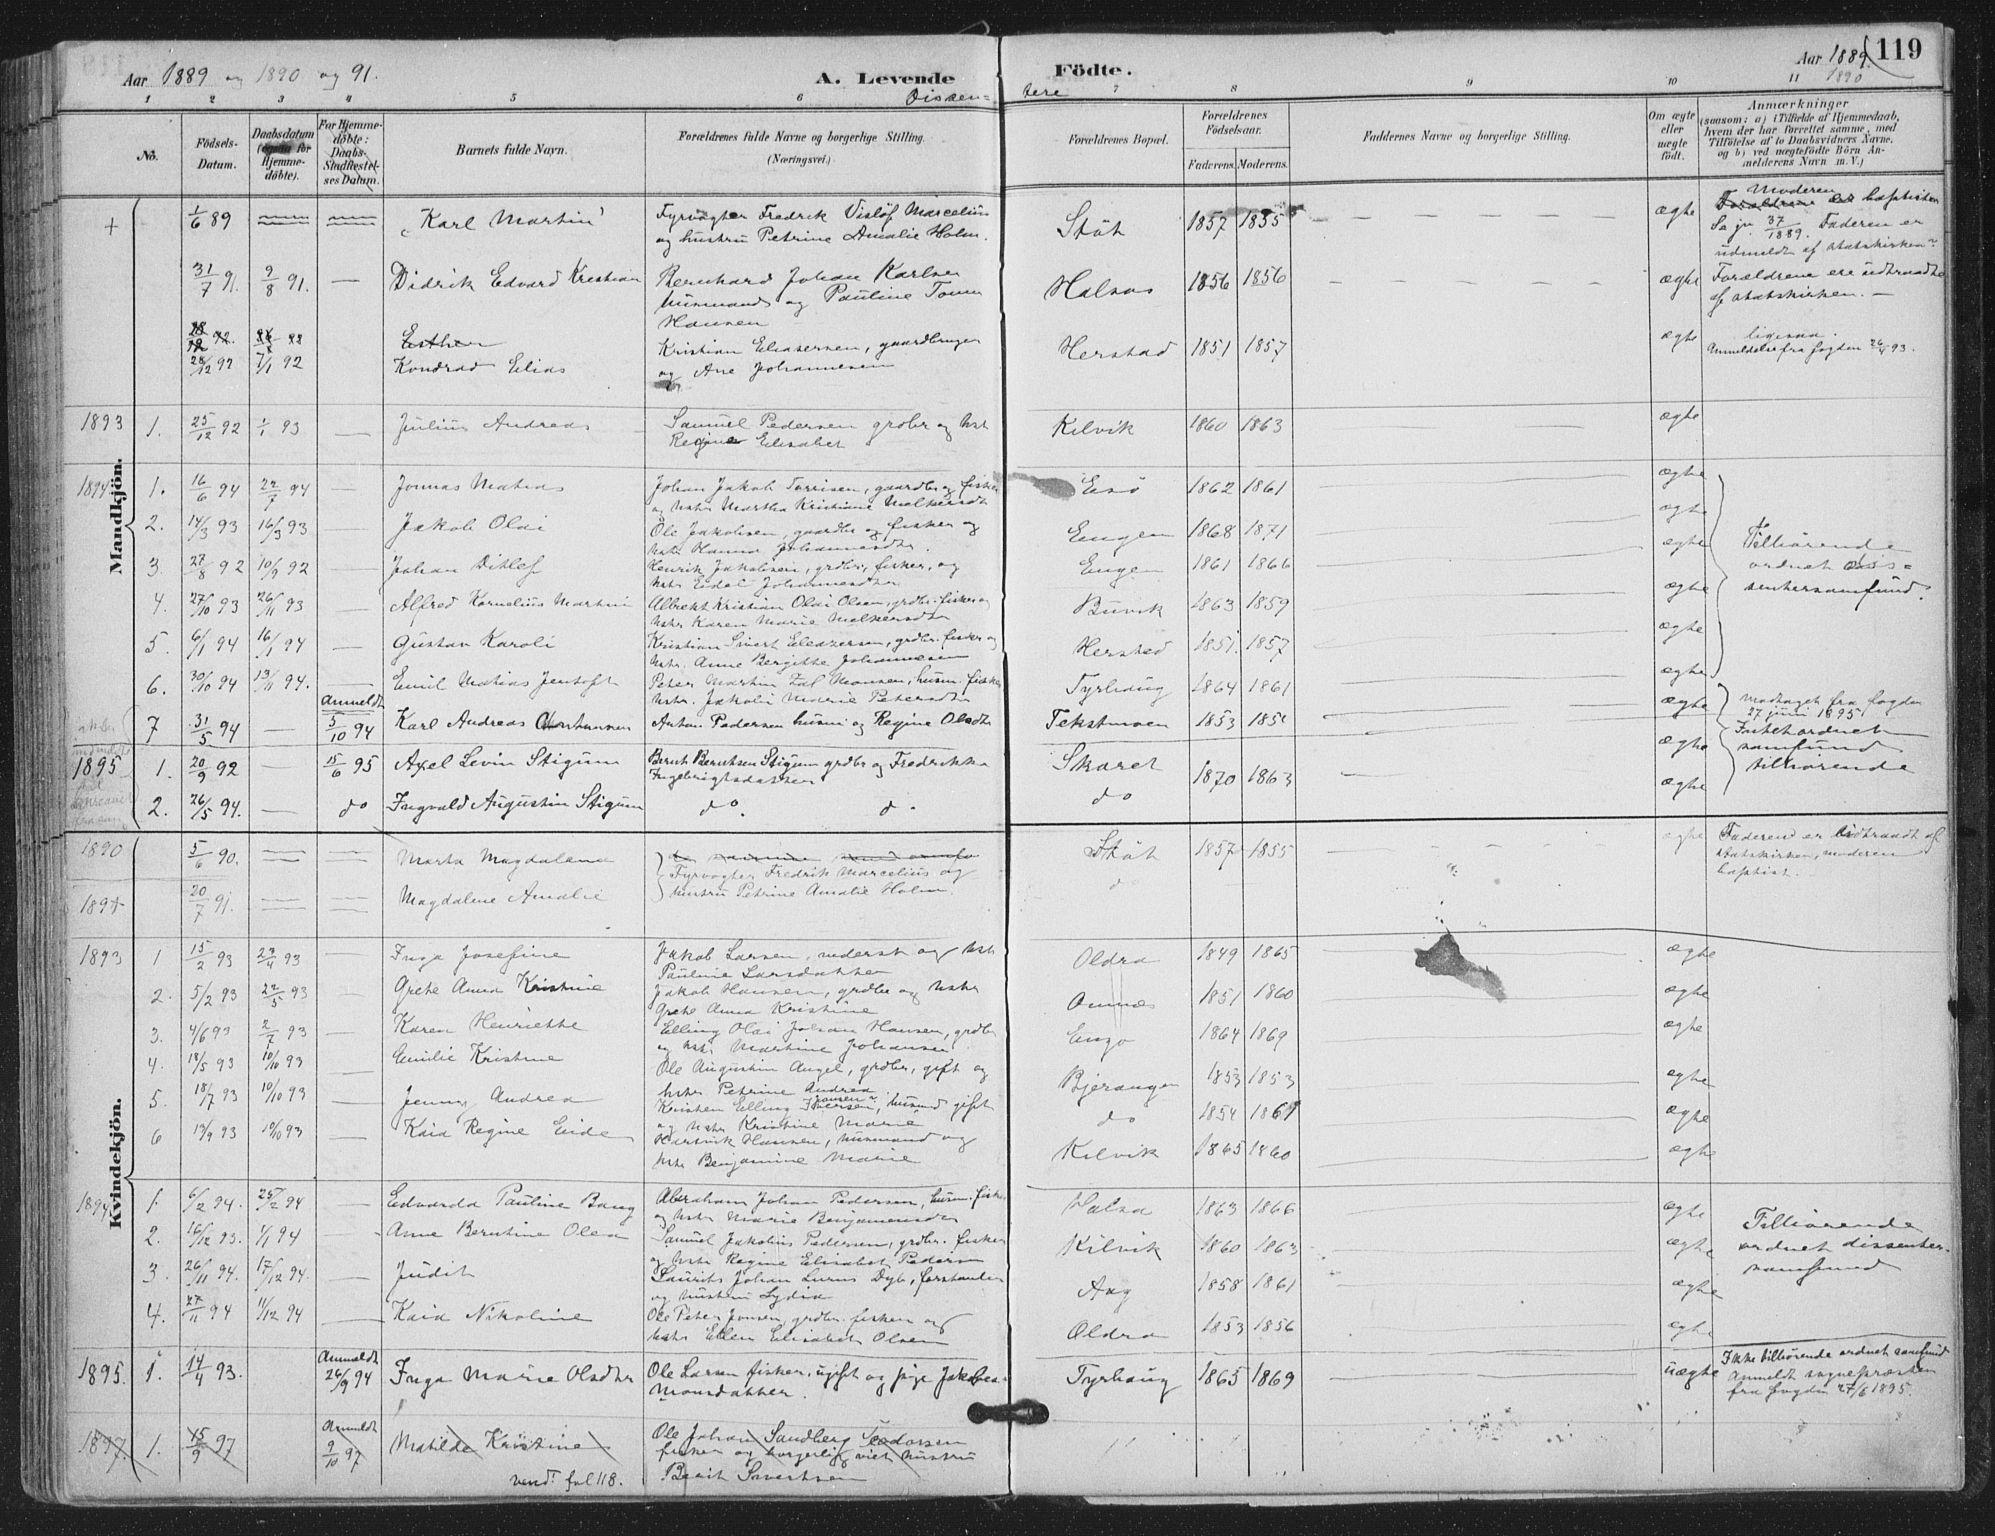 SAT, Ministerialprotokoller, klokkerbøker og fødselsregistre - Nordland, 843/L0628: Ministerialbok nr. 843A03, 1889-1907, s. 119